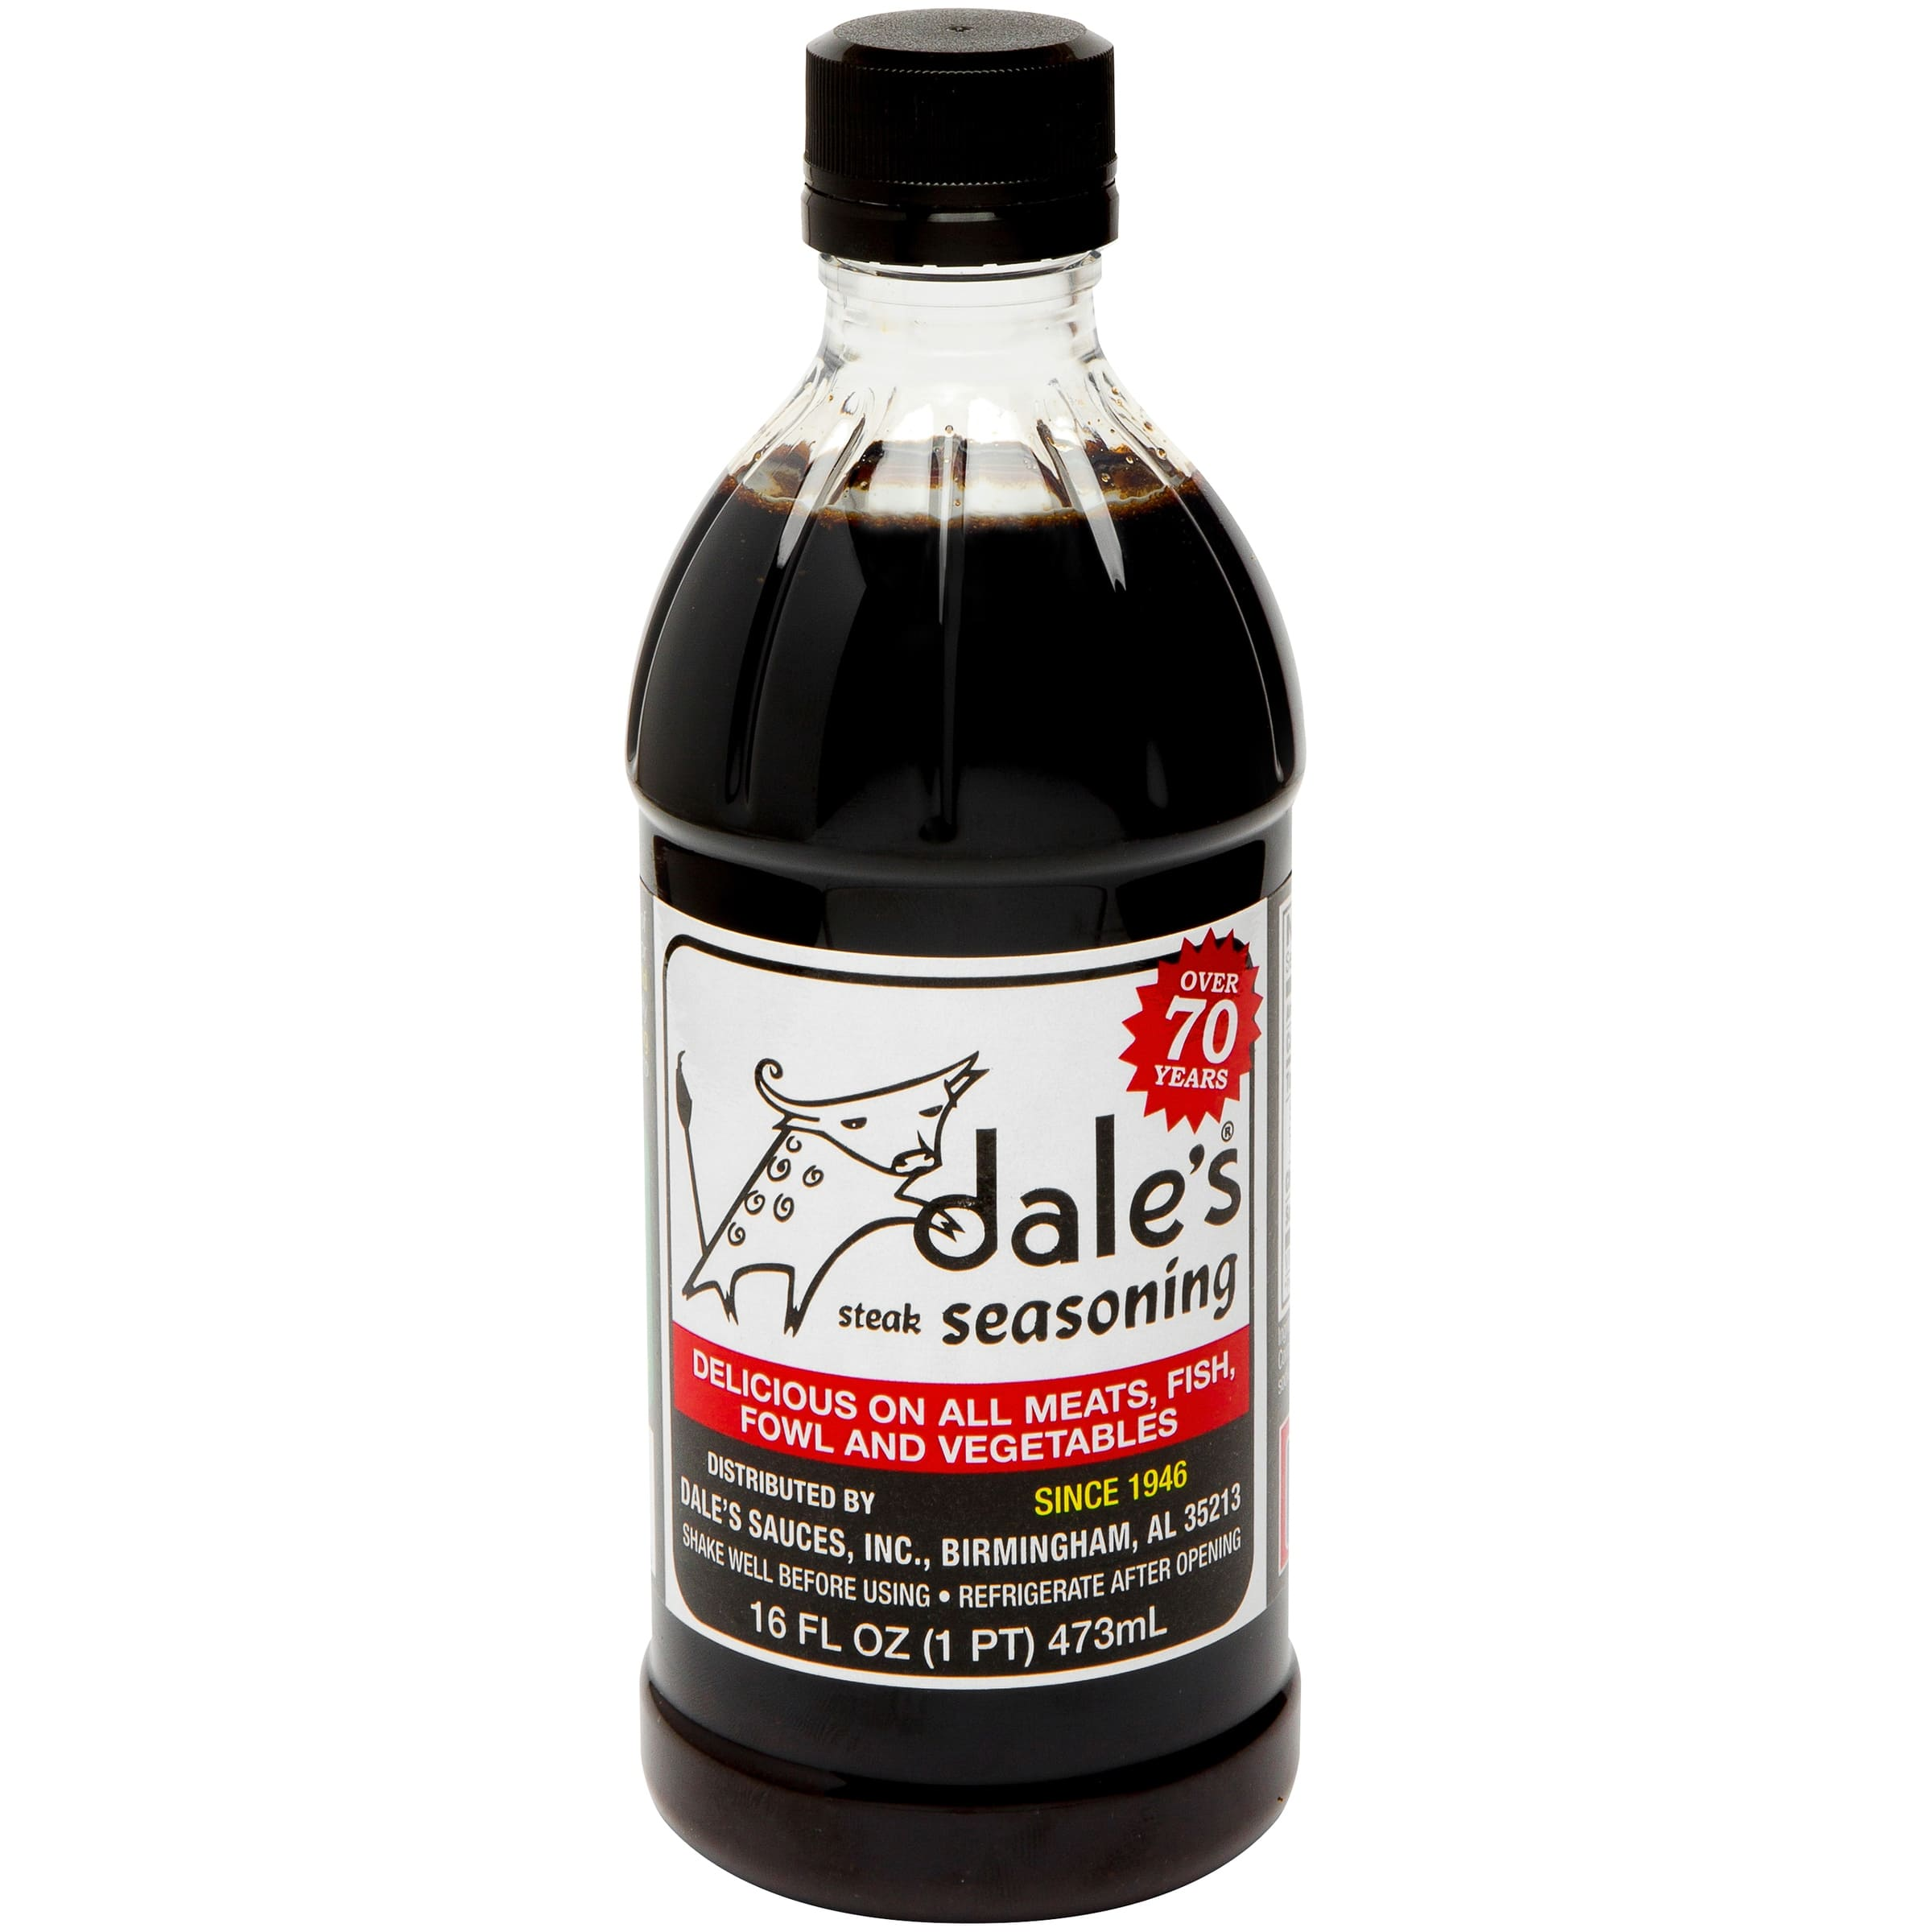 Dale's® Seasoning Steak Seasoning 16 fl. oz. Bottle $2.58 + Free Store Pickup